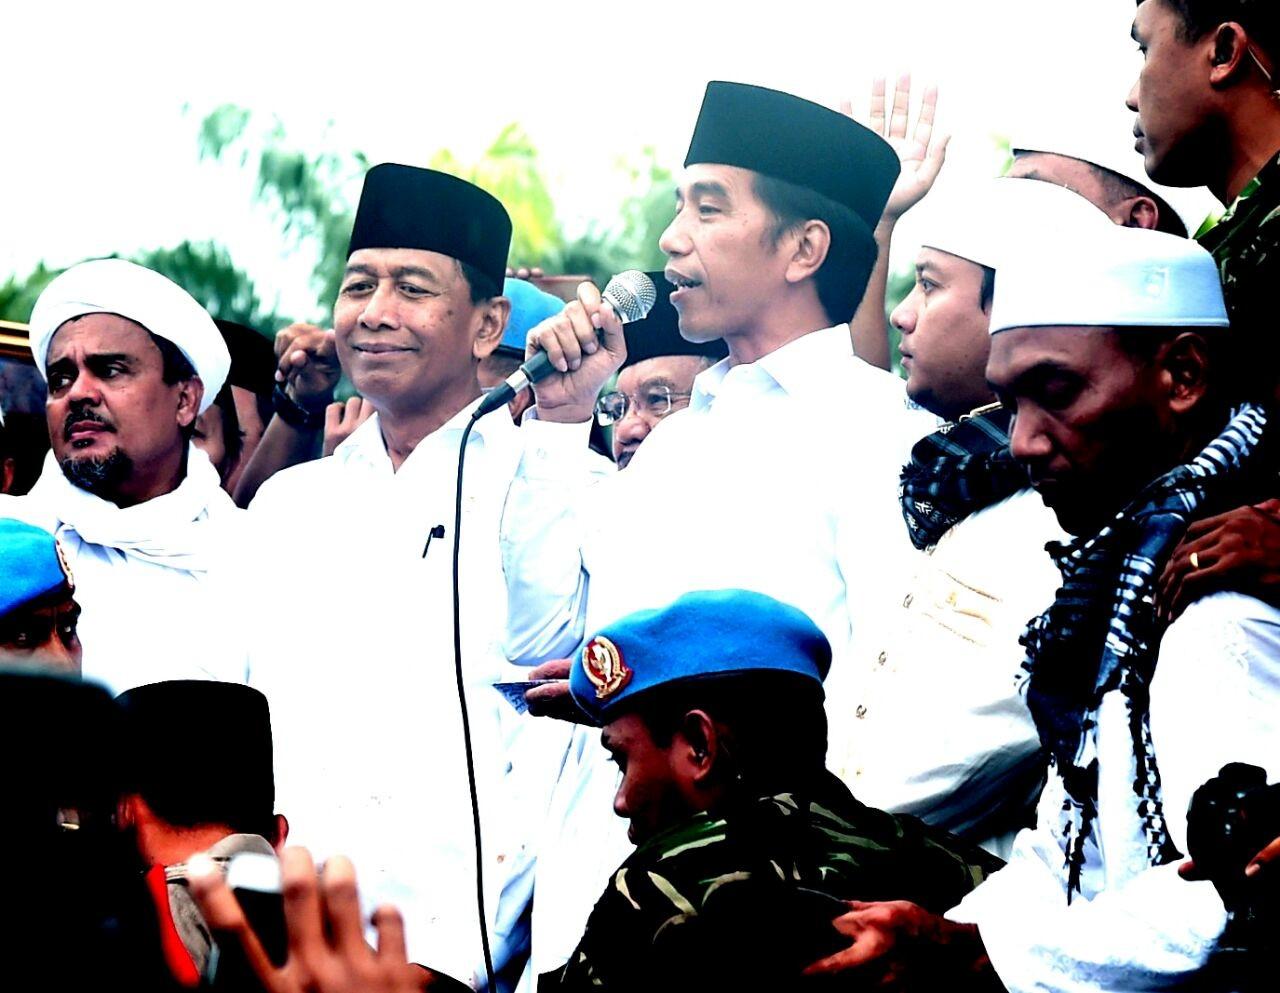 Jokowi accused of promoting secularism